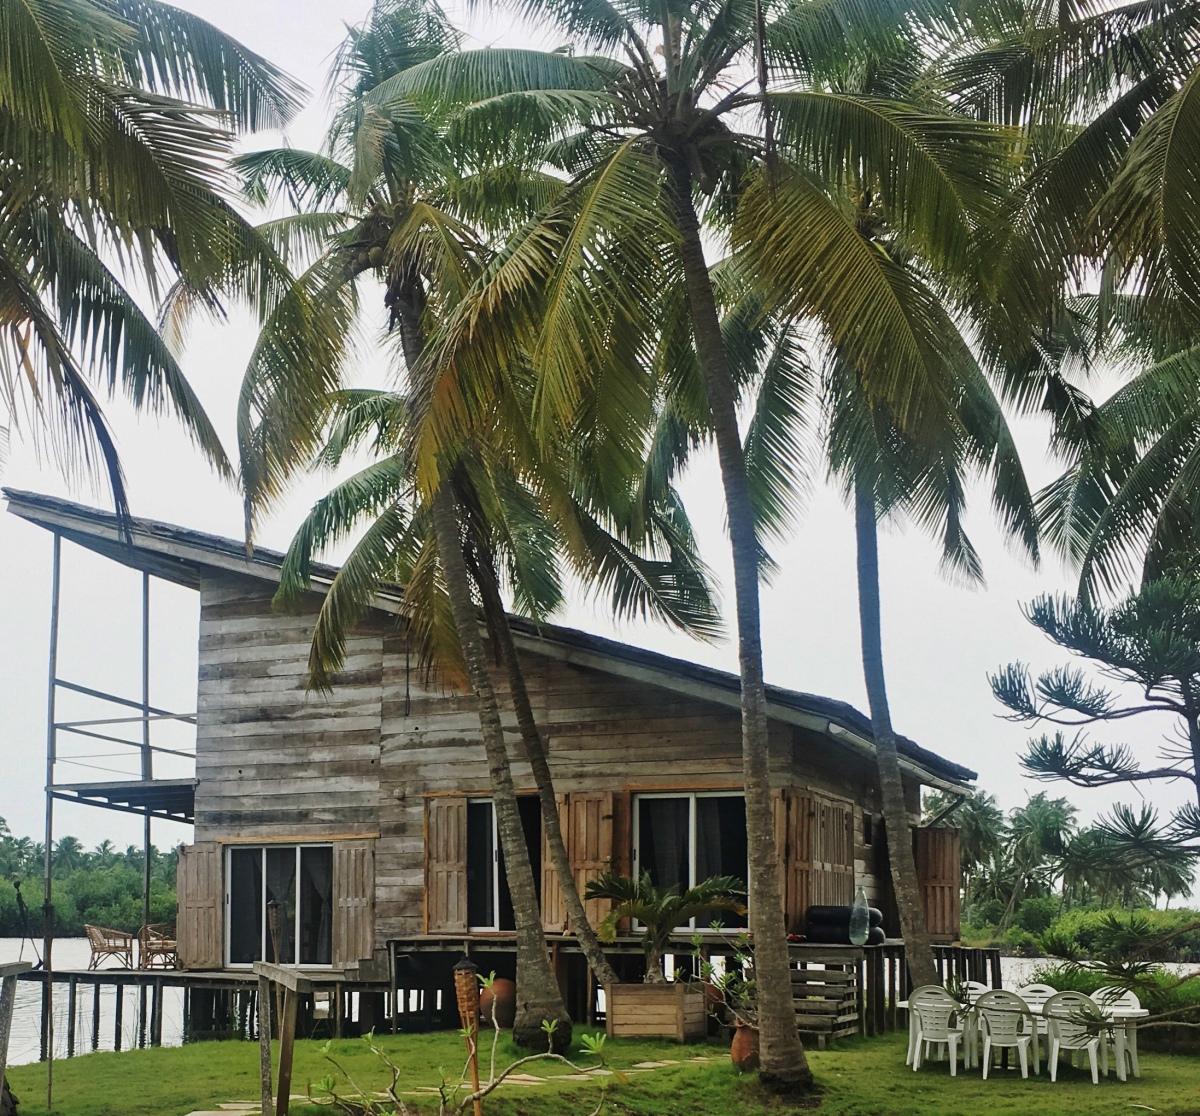 Lakehouse in Ouidah Benin Republic